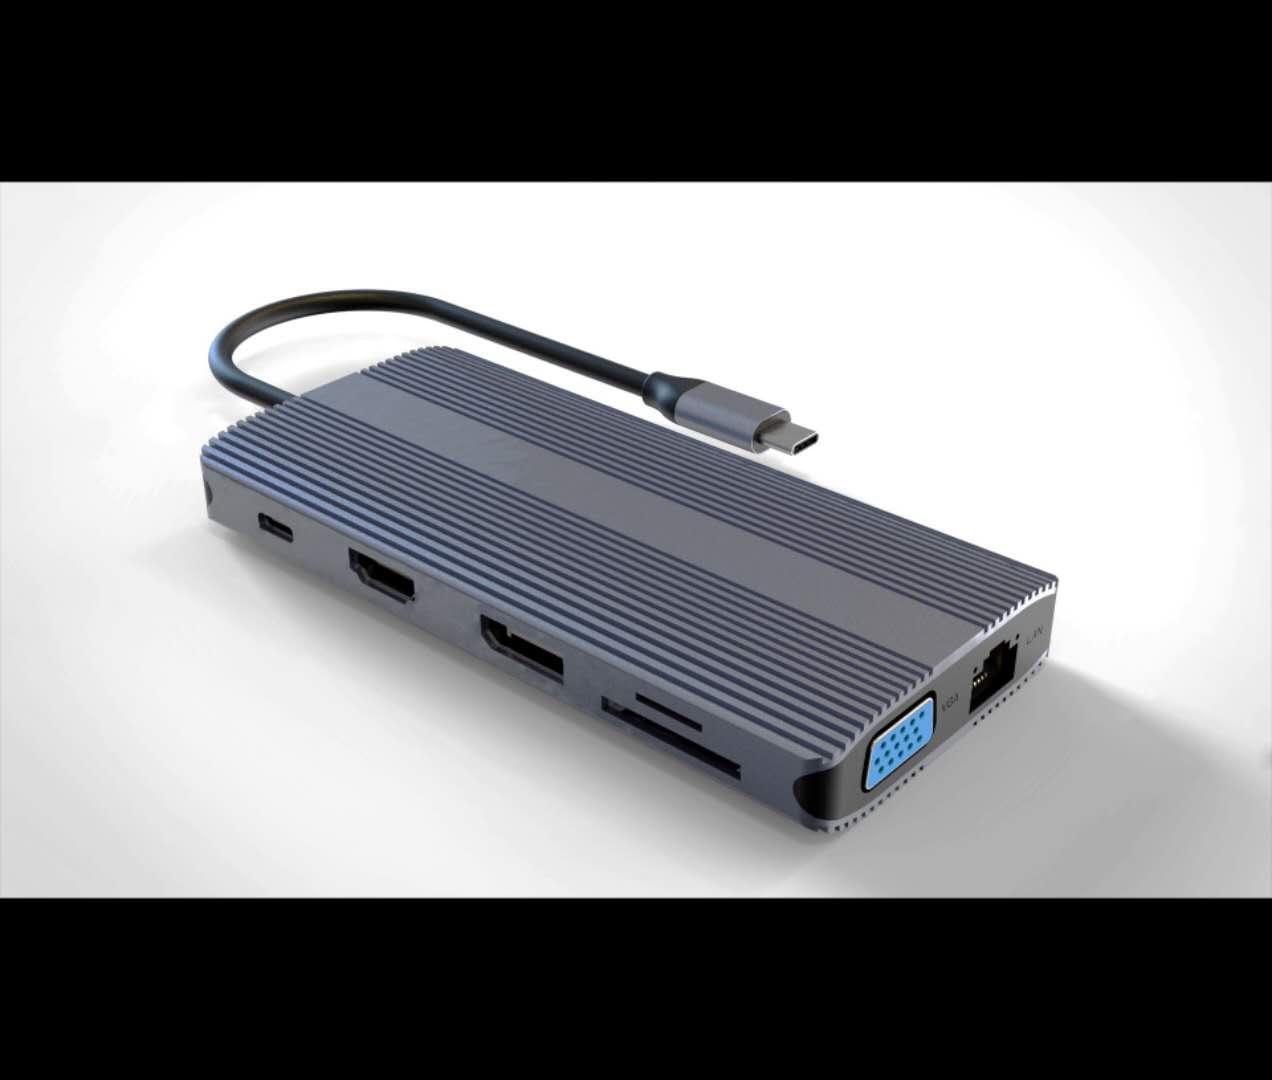 Docking station usb-c con 12 porte usb, hdmi,  dp, vga, pd, audio, gigabit, card, per notebook tablet smartphone